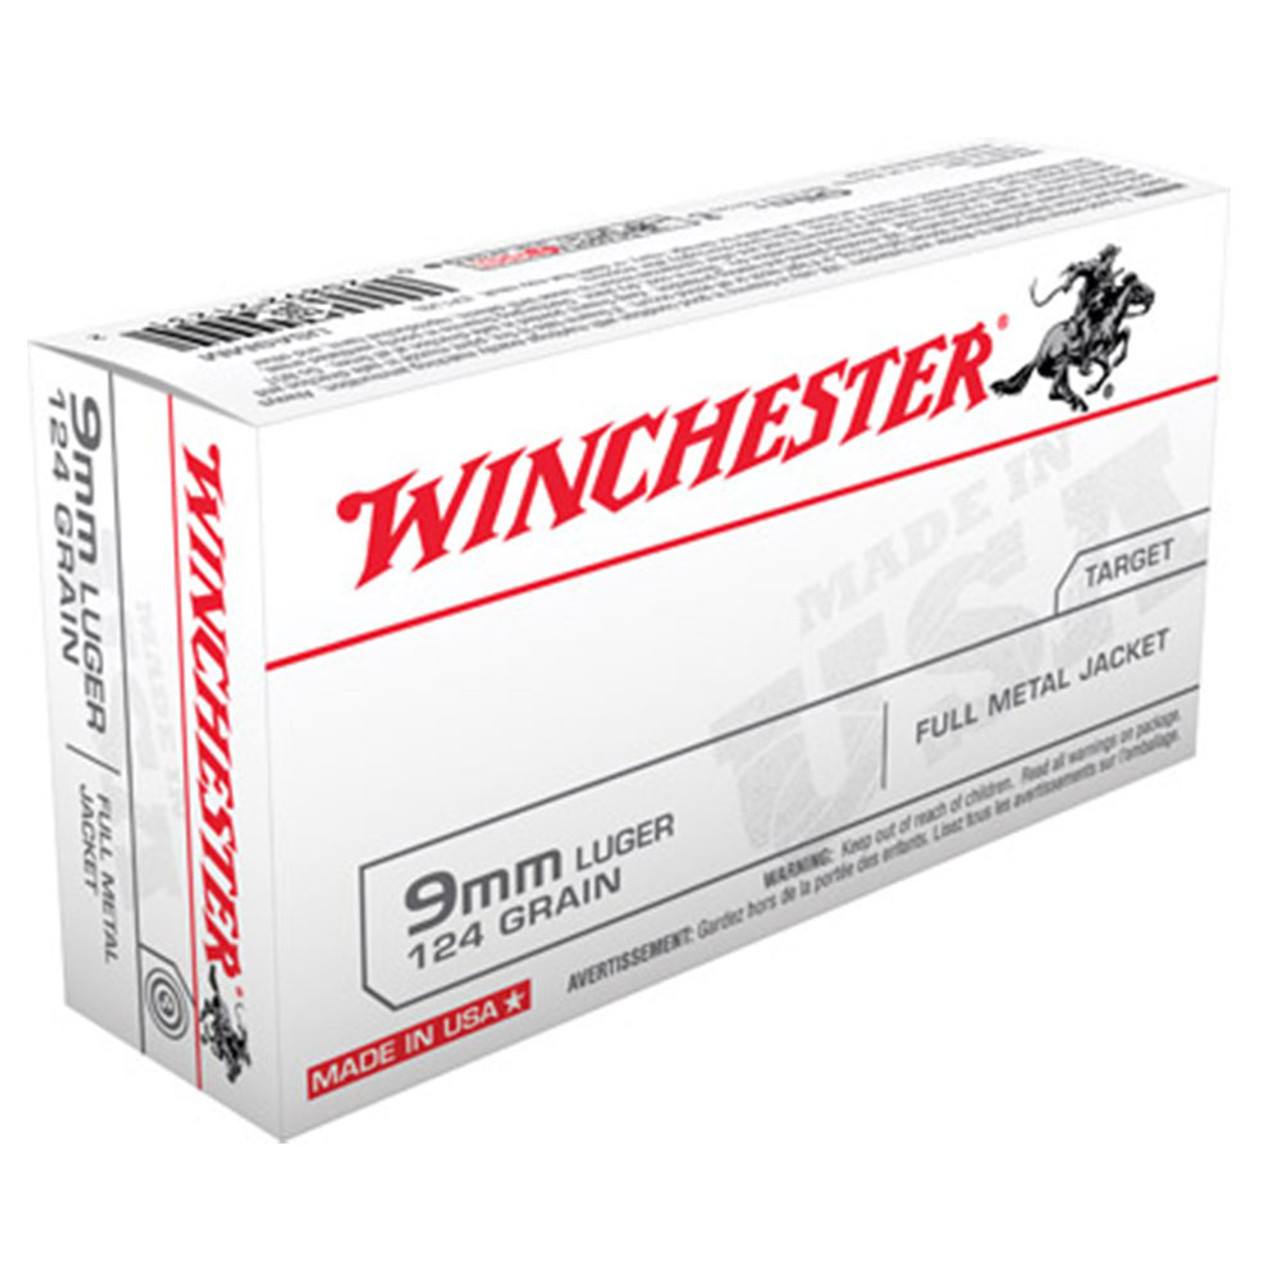 Winchester 9mm 124gr  Full Metal Jacket